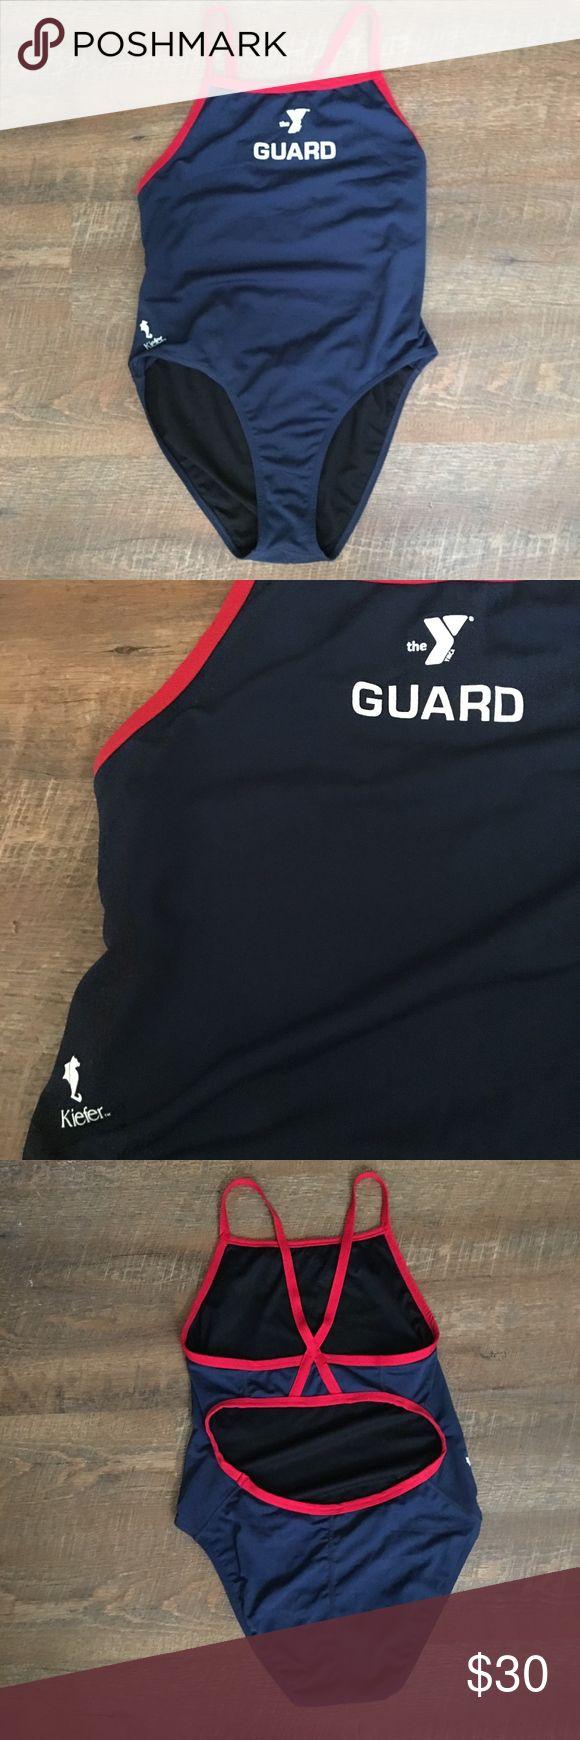 Kiefer Lifeguard OnePiece Swimsuit Size 36 Color Navy